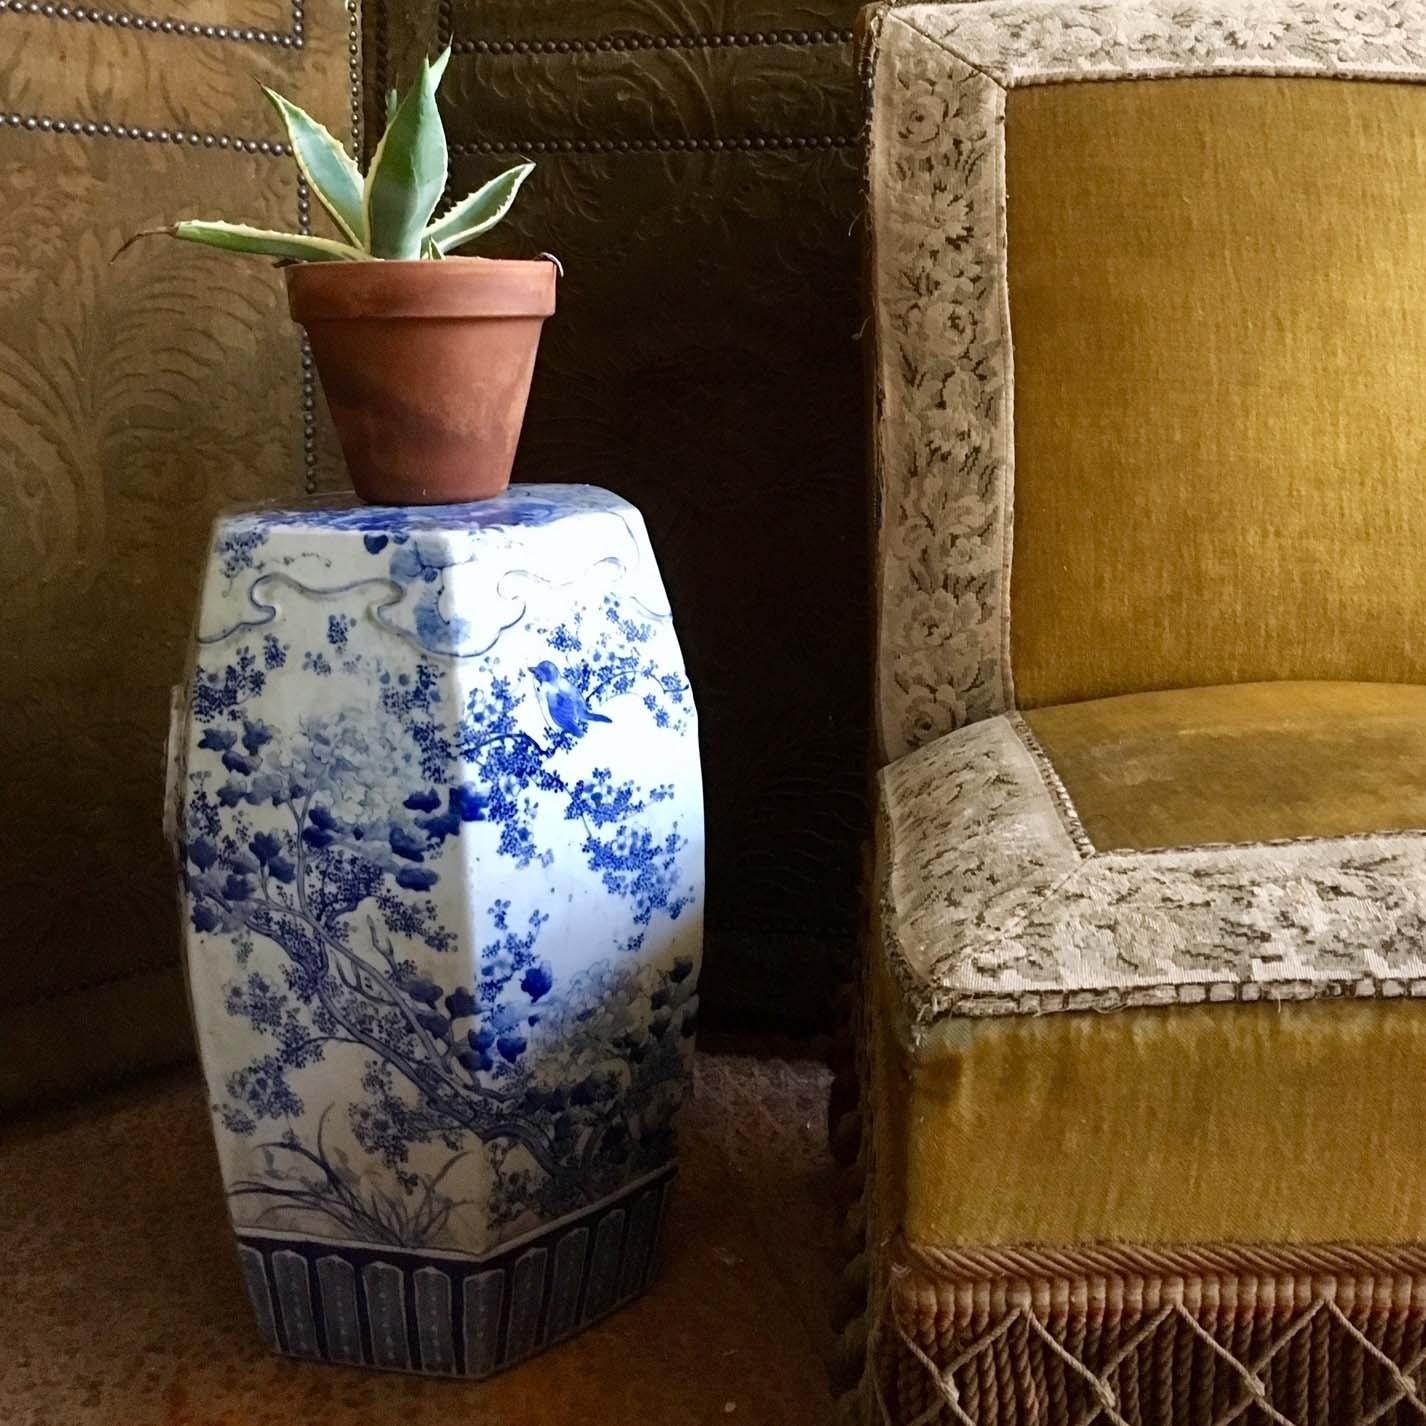 Vintage keramiek chinoiserie krukje (verkocht)